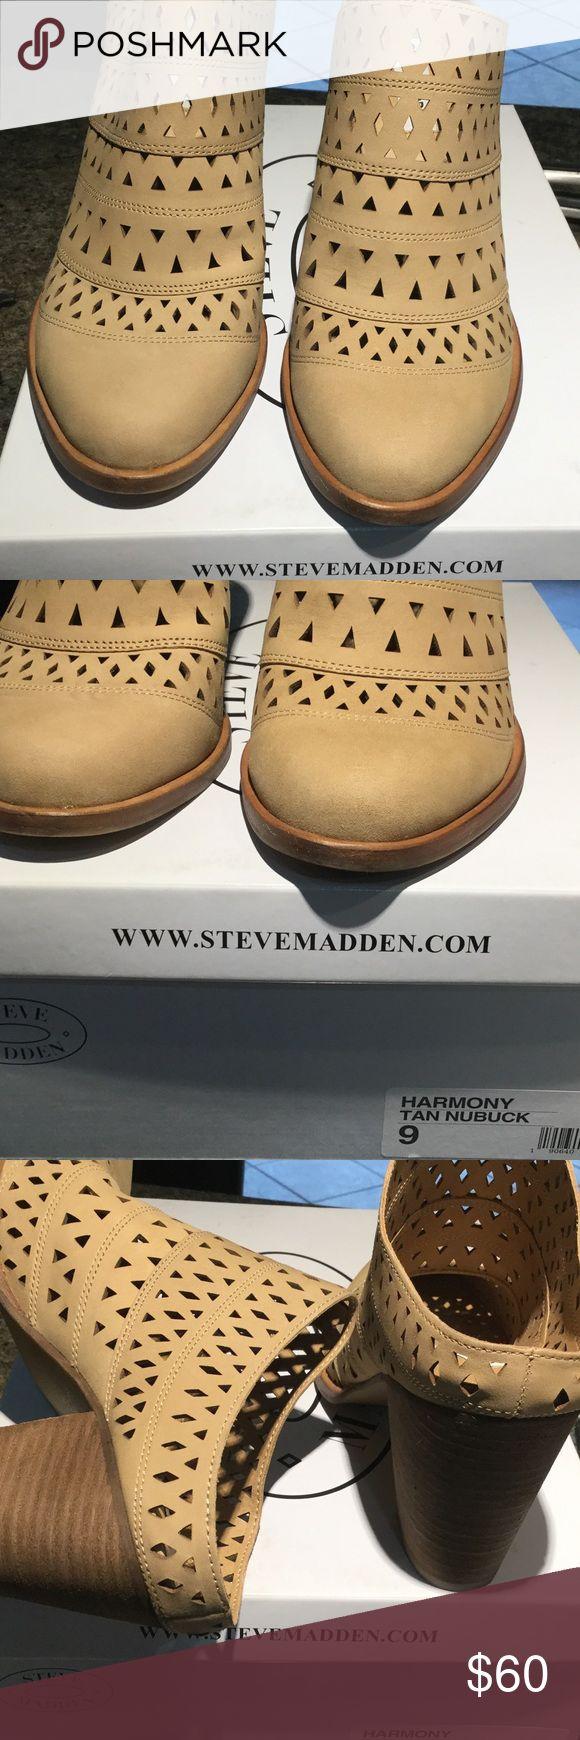 Steve Madden harmony tan Mules NWT Steve Madden harmony tan Mules NWT Steve Madden Shoes Mules & Clogs